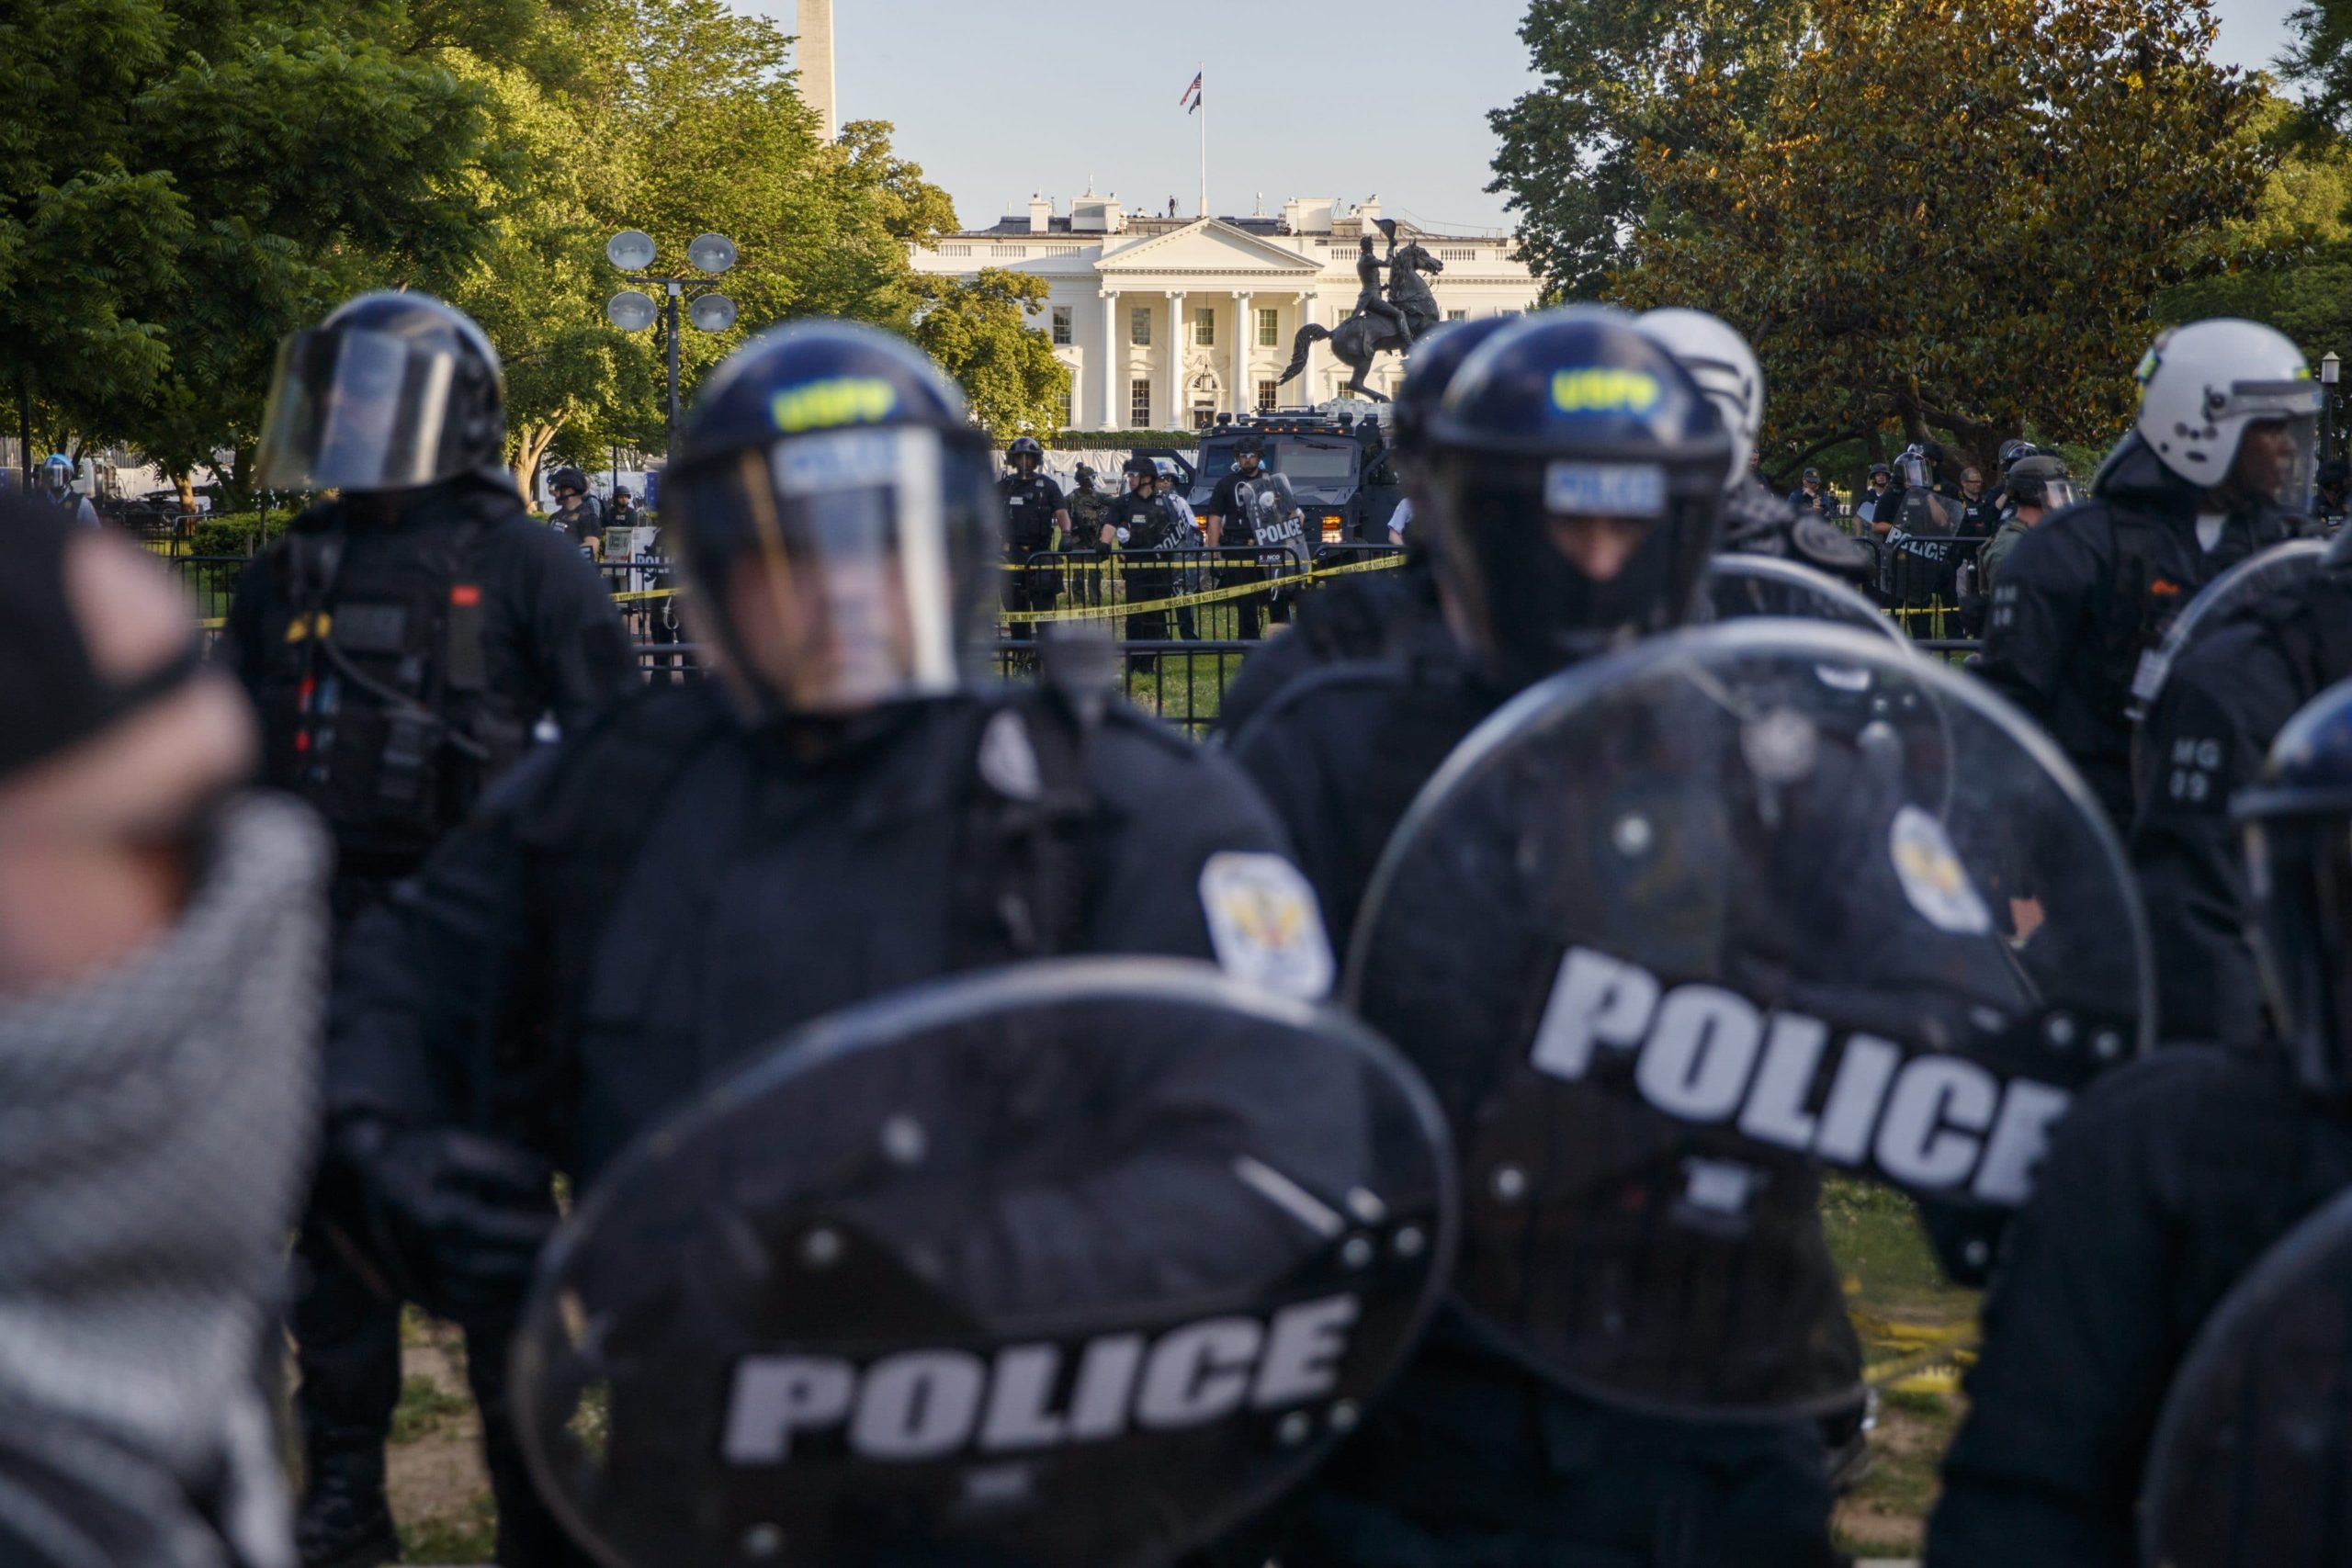 USA on brink of civil war